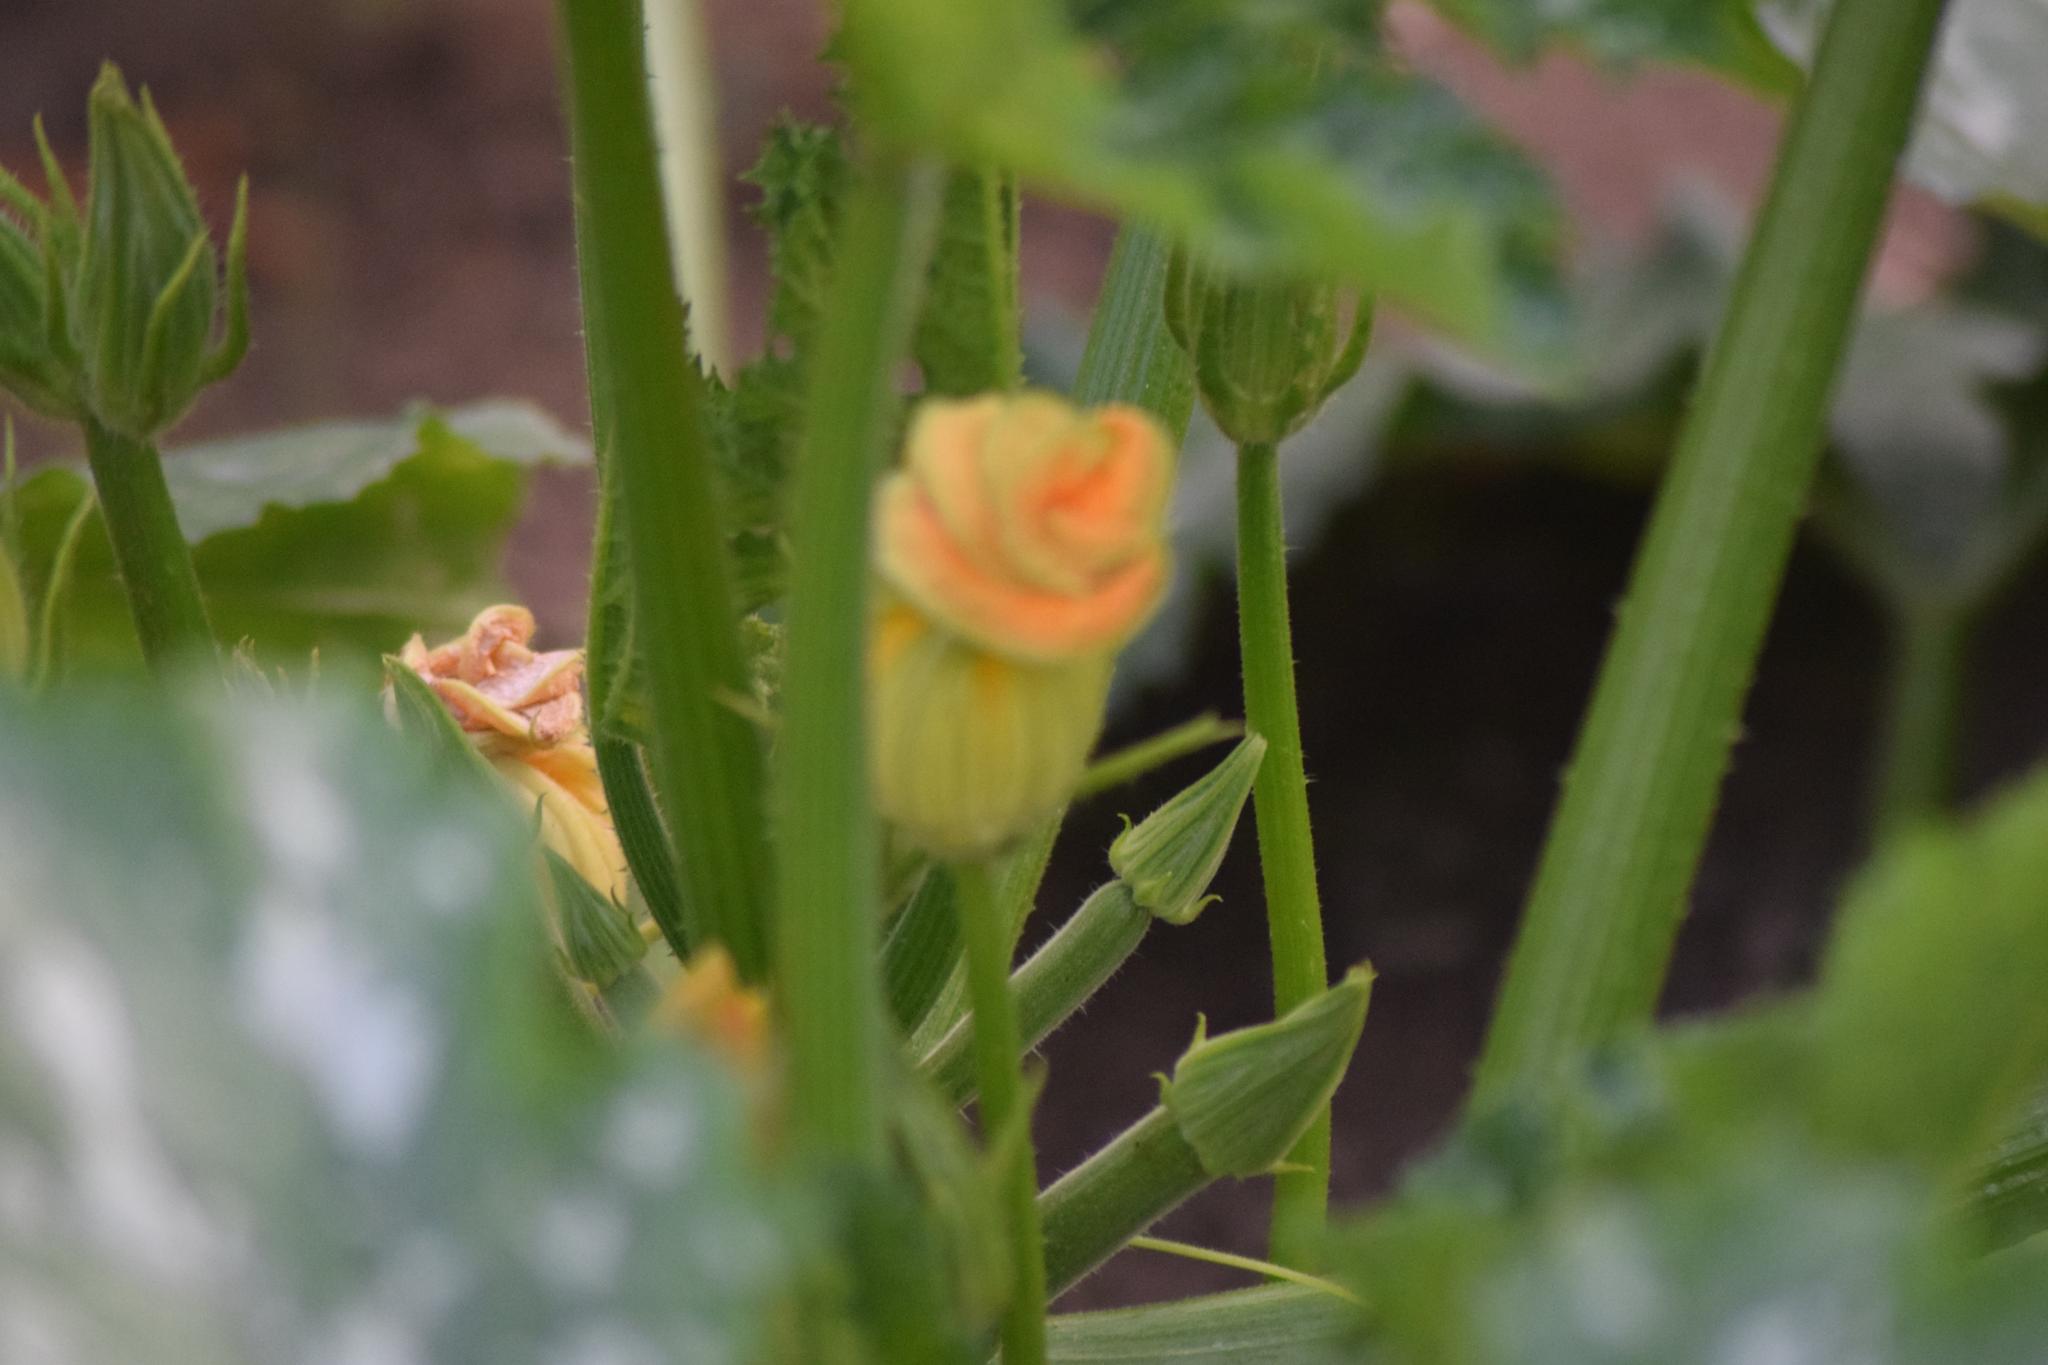 zucchini flower by evelyn.vinson